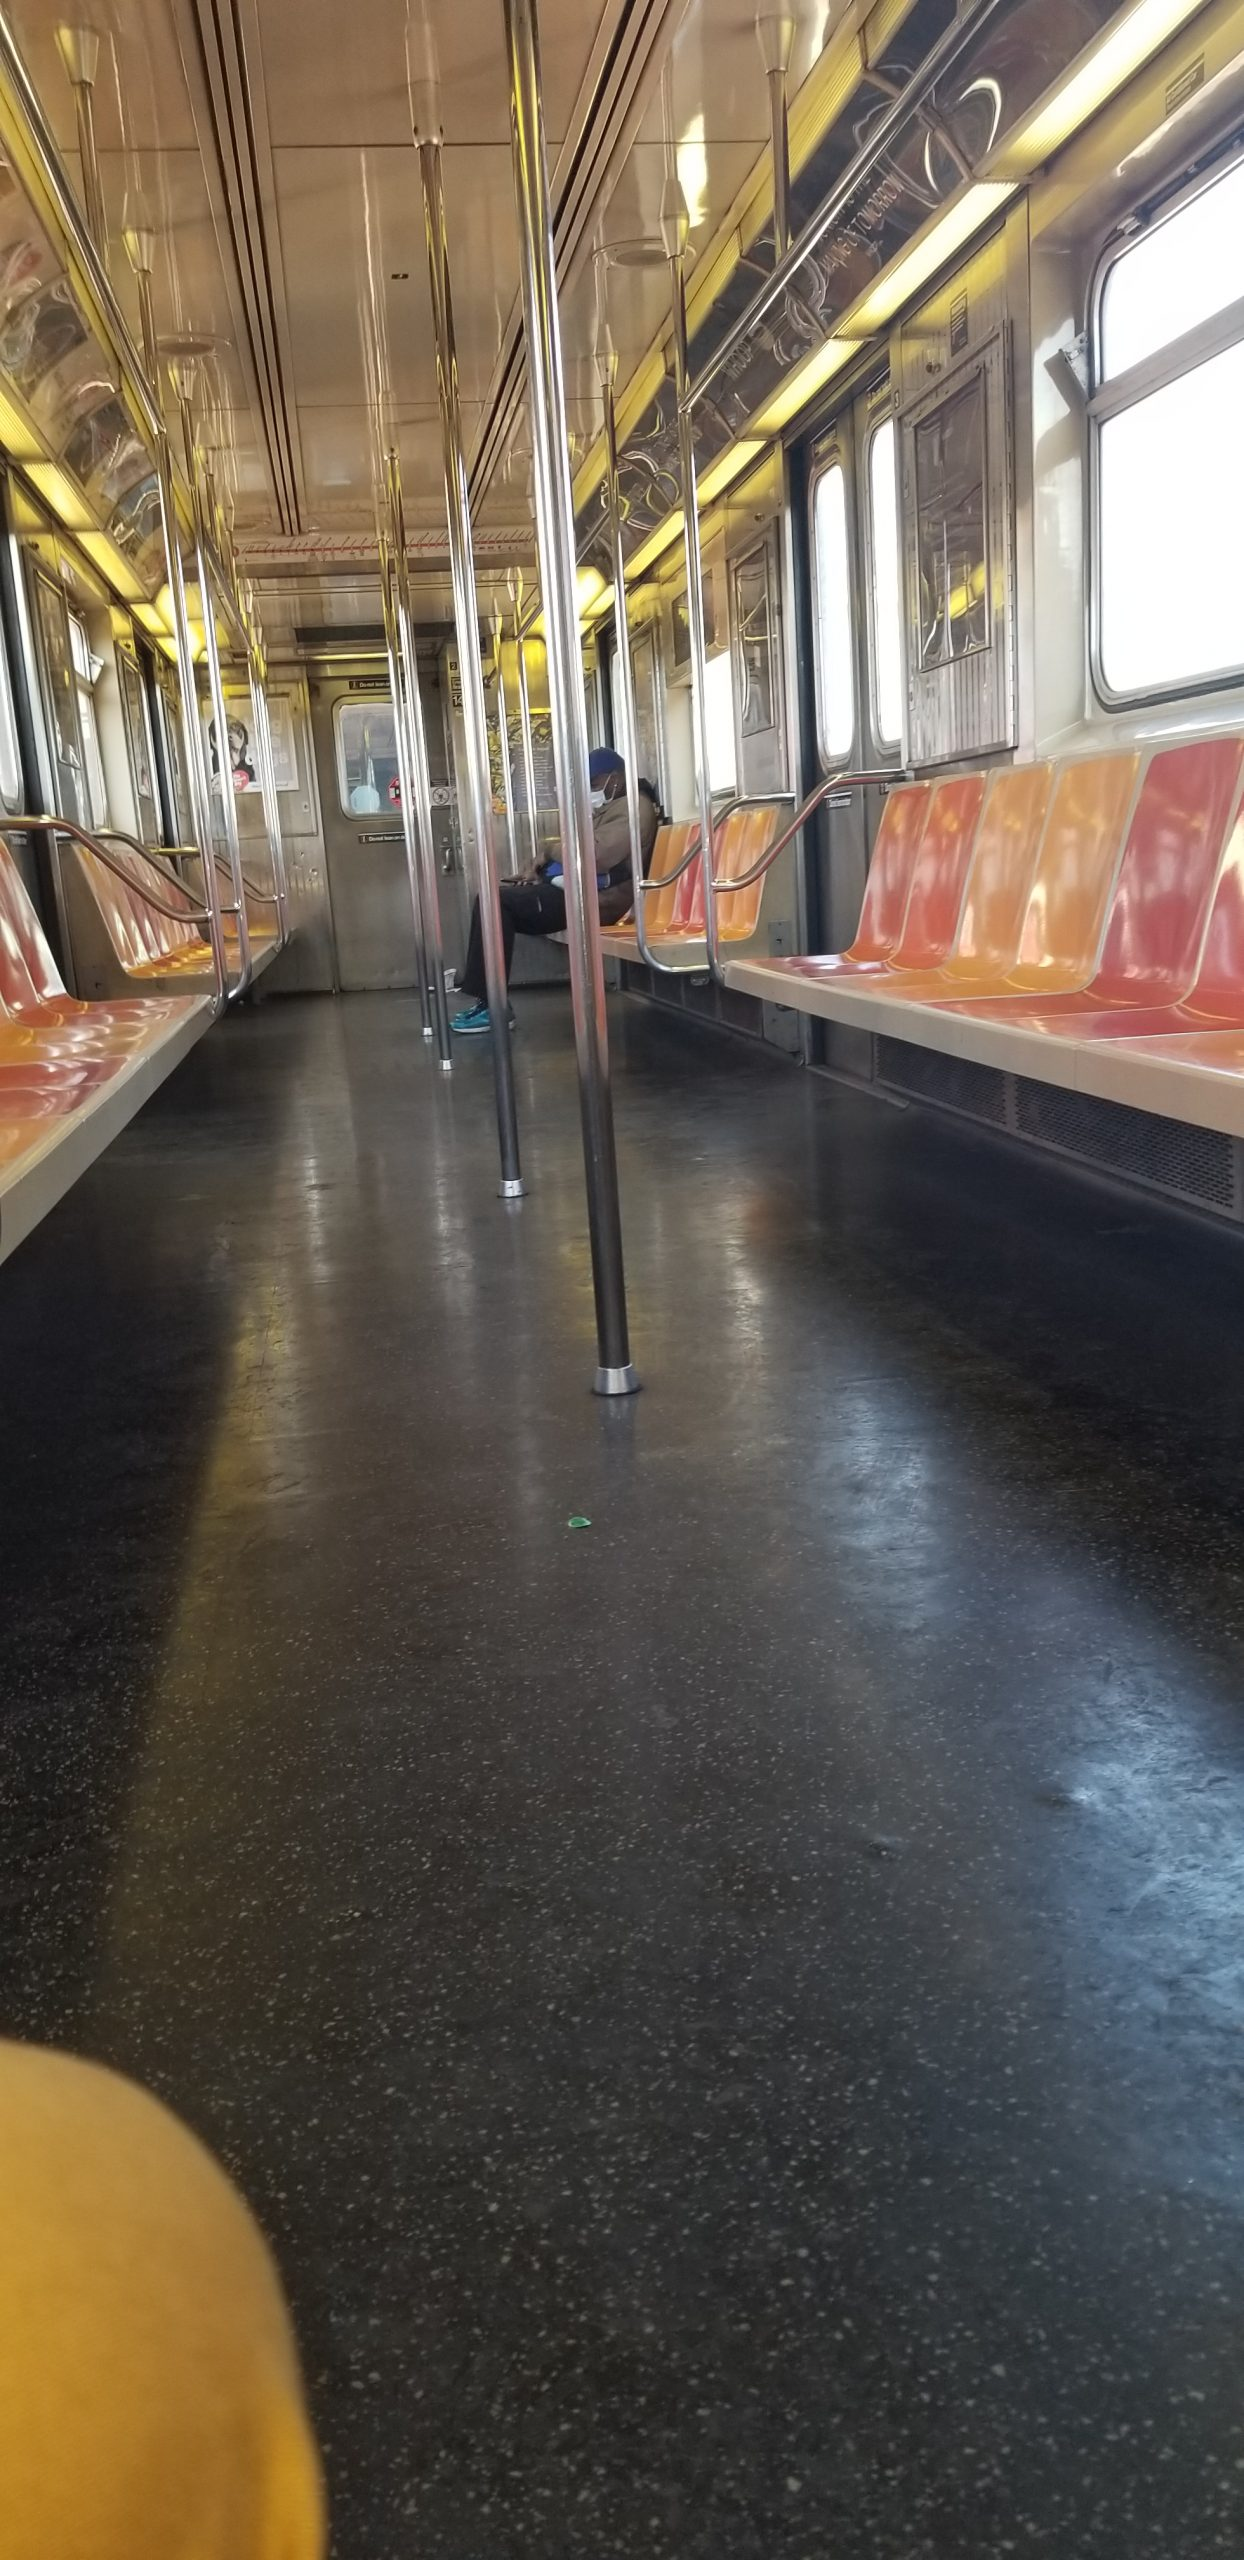 NYC Train COVID-19